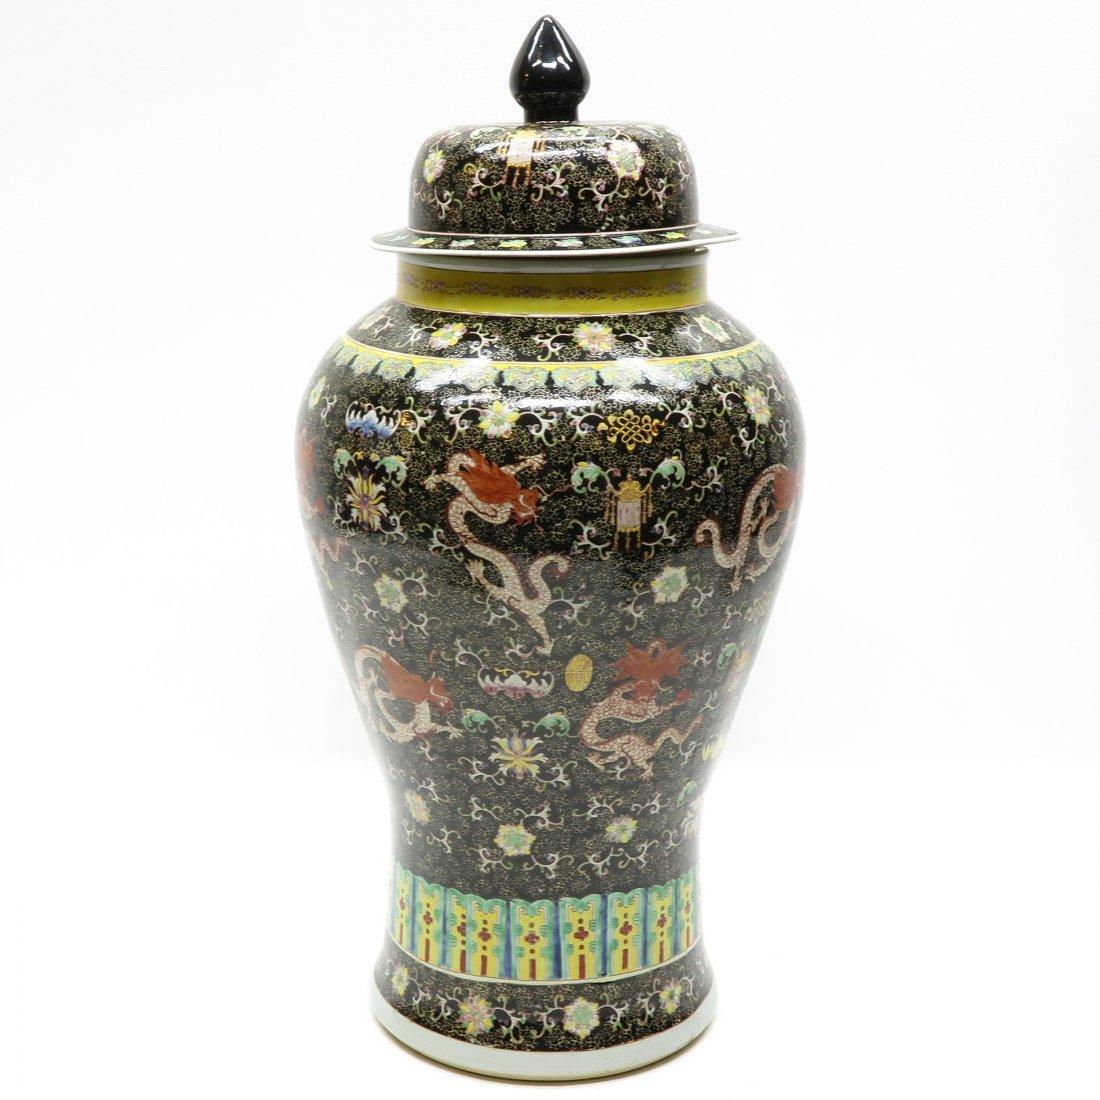 China Porcelain Famille Noir Lidded Vase - 4